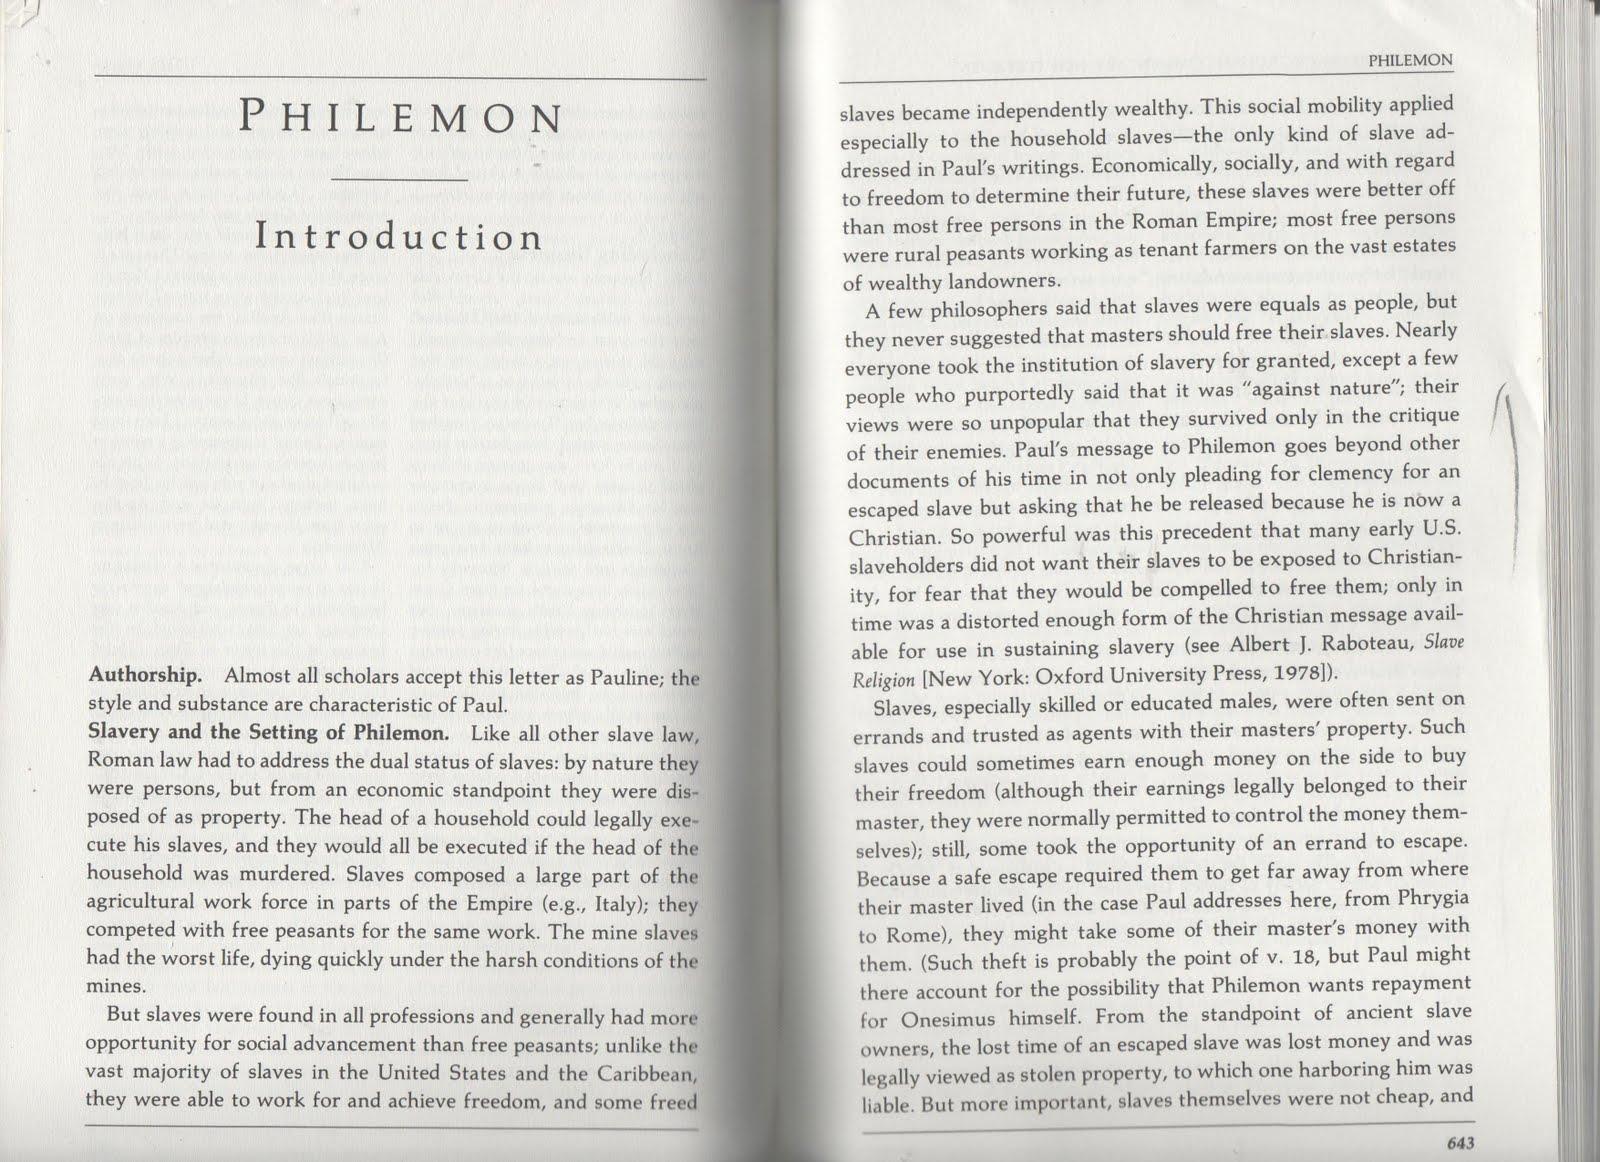 BIB 451 Fall 12: Philemon help